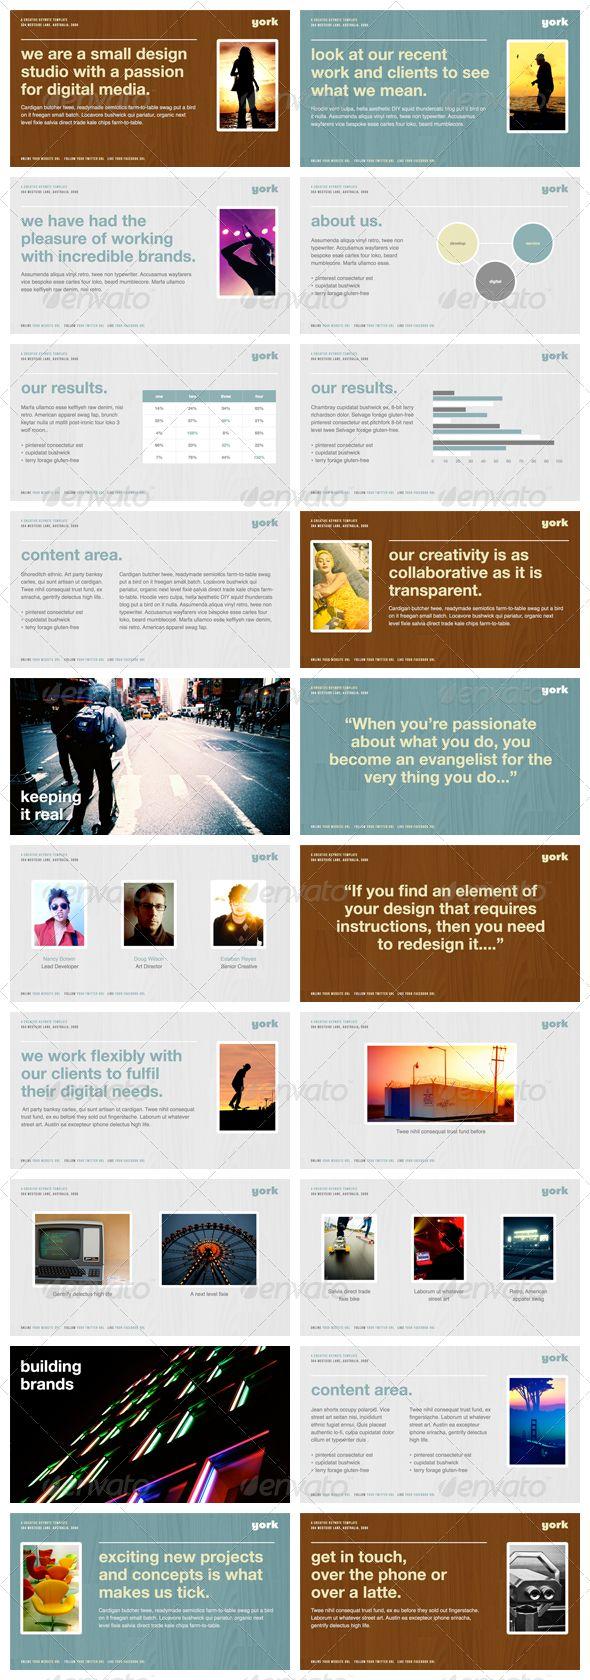 York - Powerpoint Presentation Template